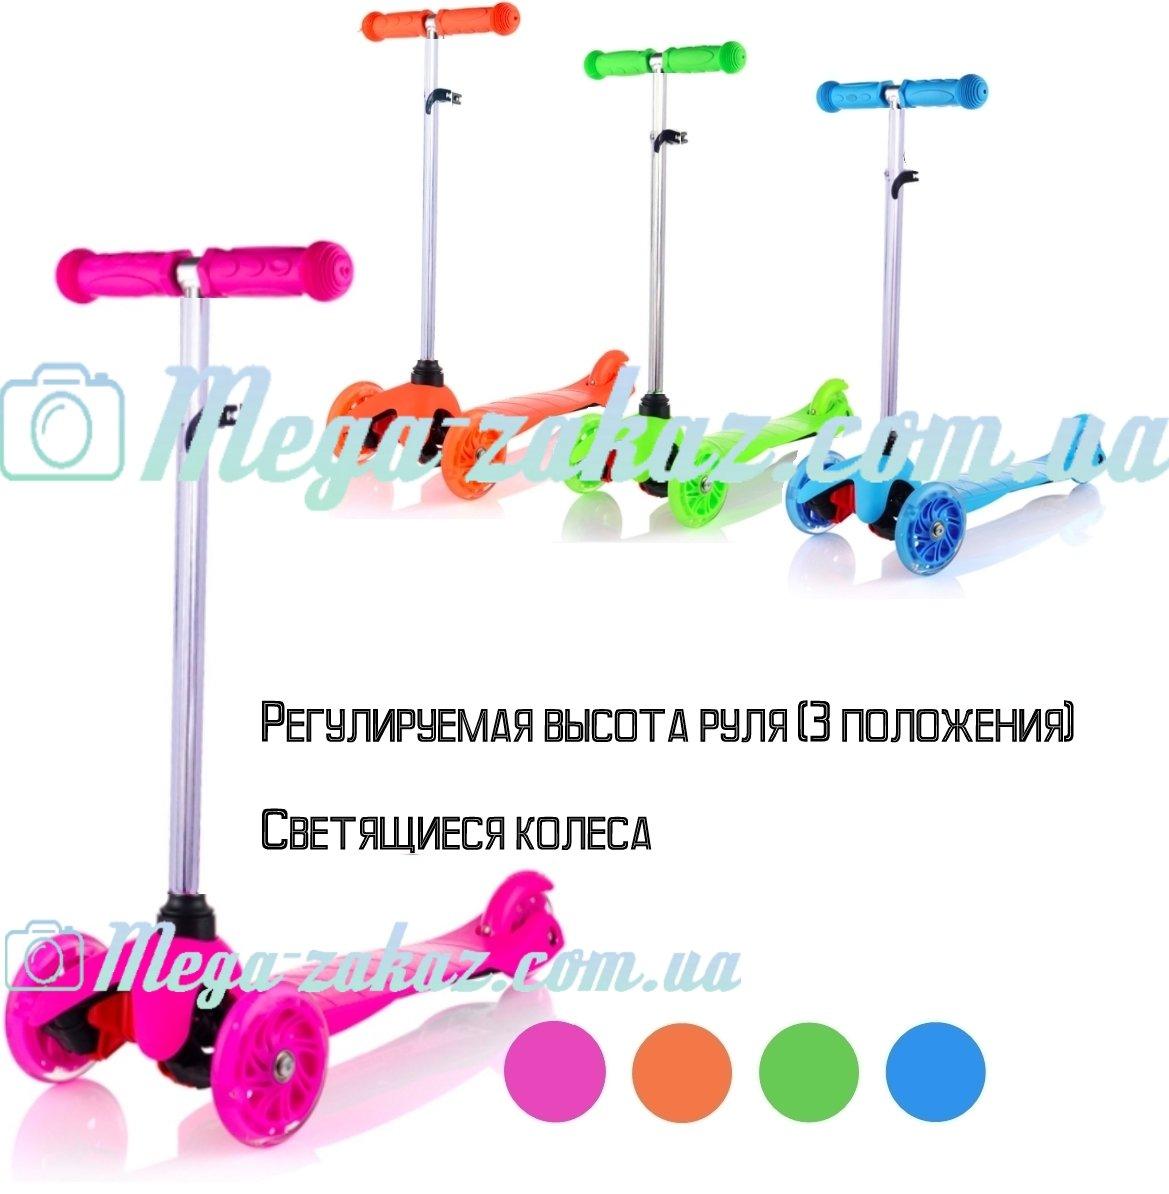 http://mega-zakaz.com.ua/images/upload/scooter%20happy123ZAKAZ.jpg